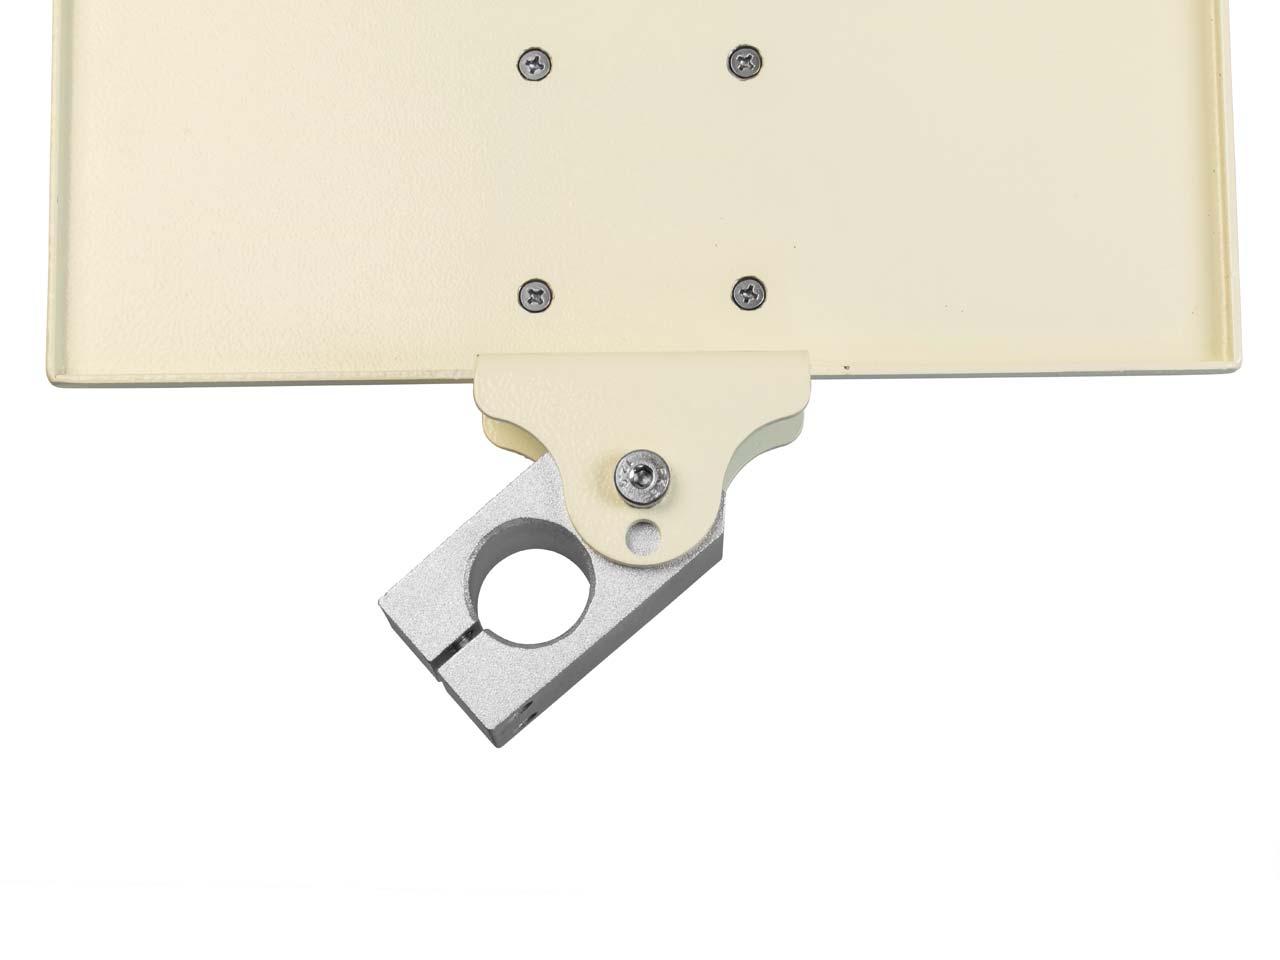 Genuine-US-Foredom-Workbench-Accessories-System miniatura 40